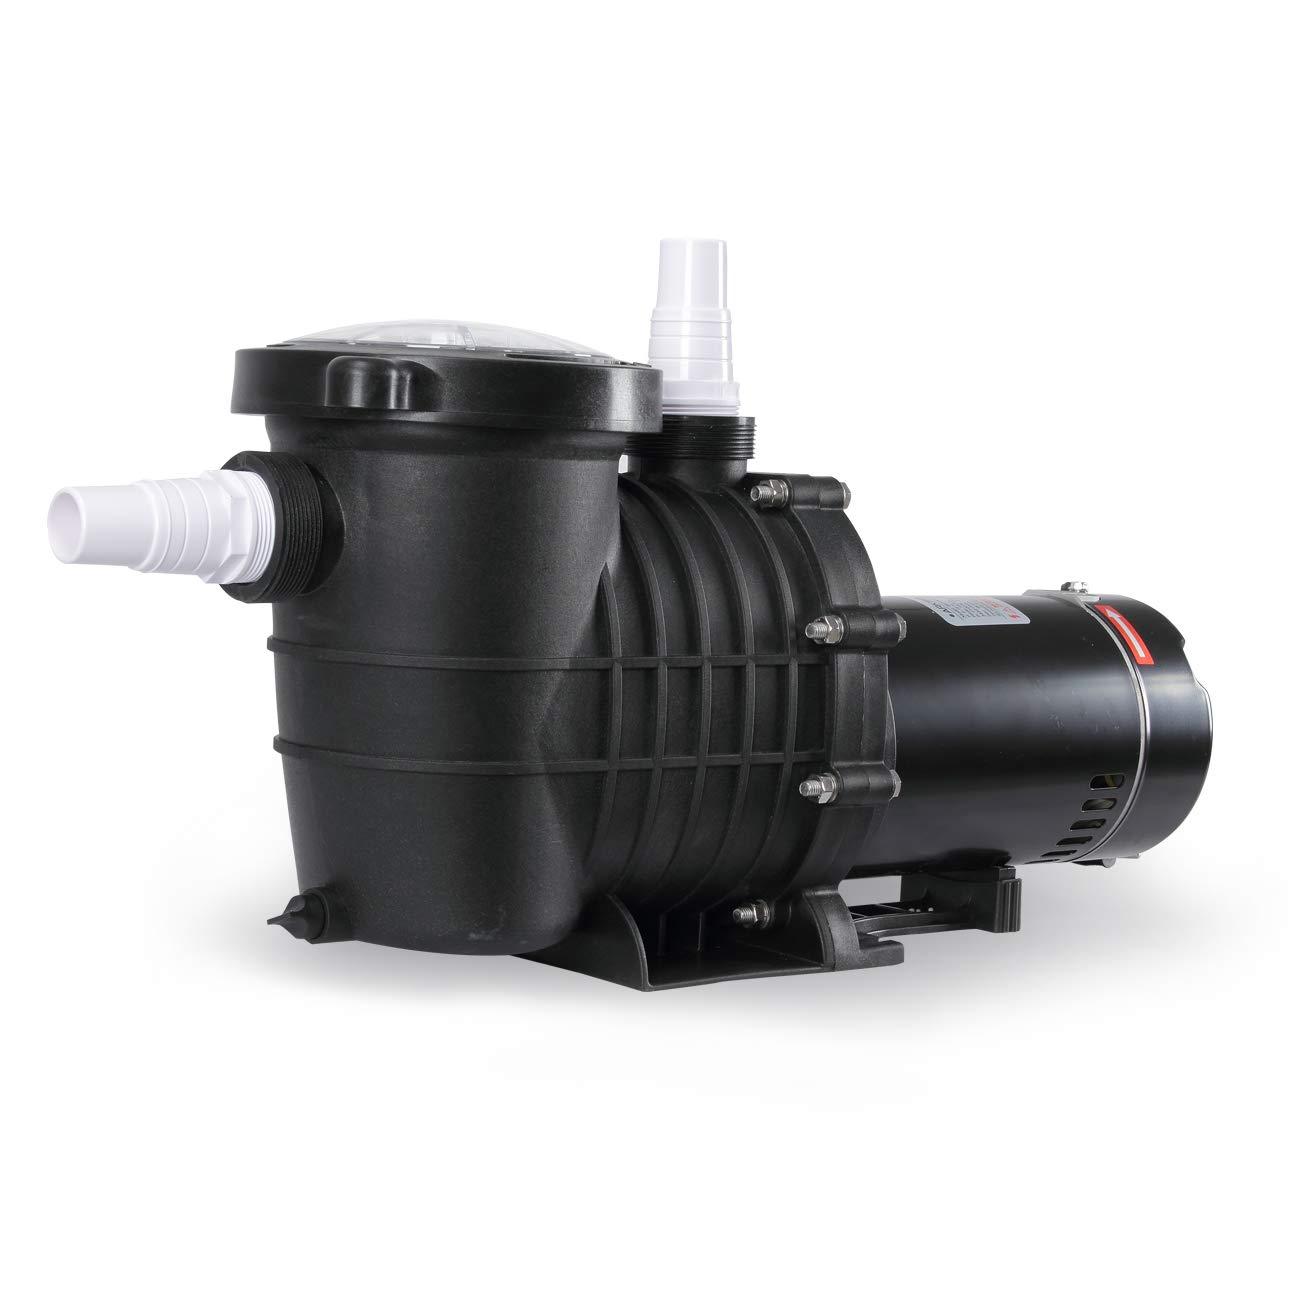 ARKSEN 1.5HP Heavy Duty Swimming Pool Pump High-Flo Motor UL Listed Pool Spa Energy Saving 1-1/2'' NPT w/Hose Adapters